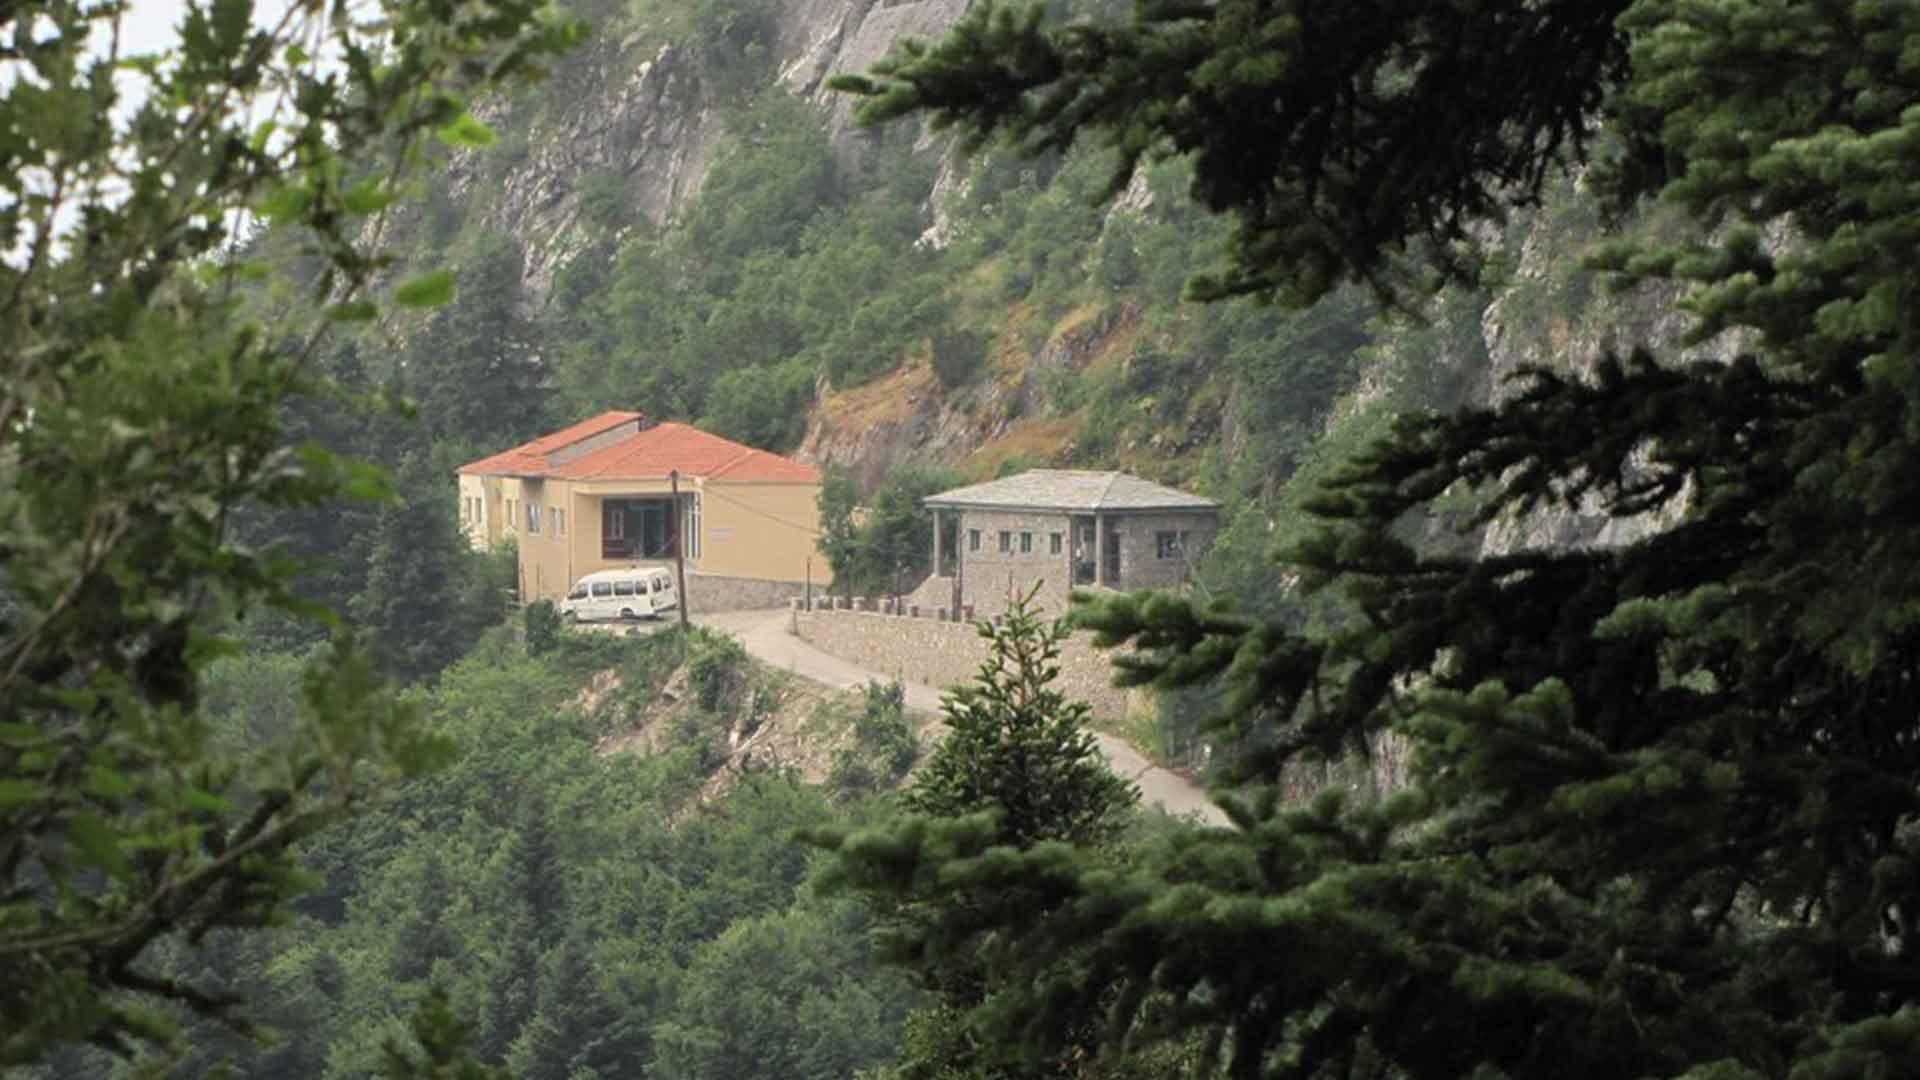 Spa tourism